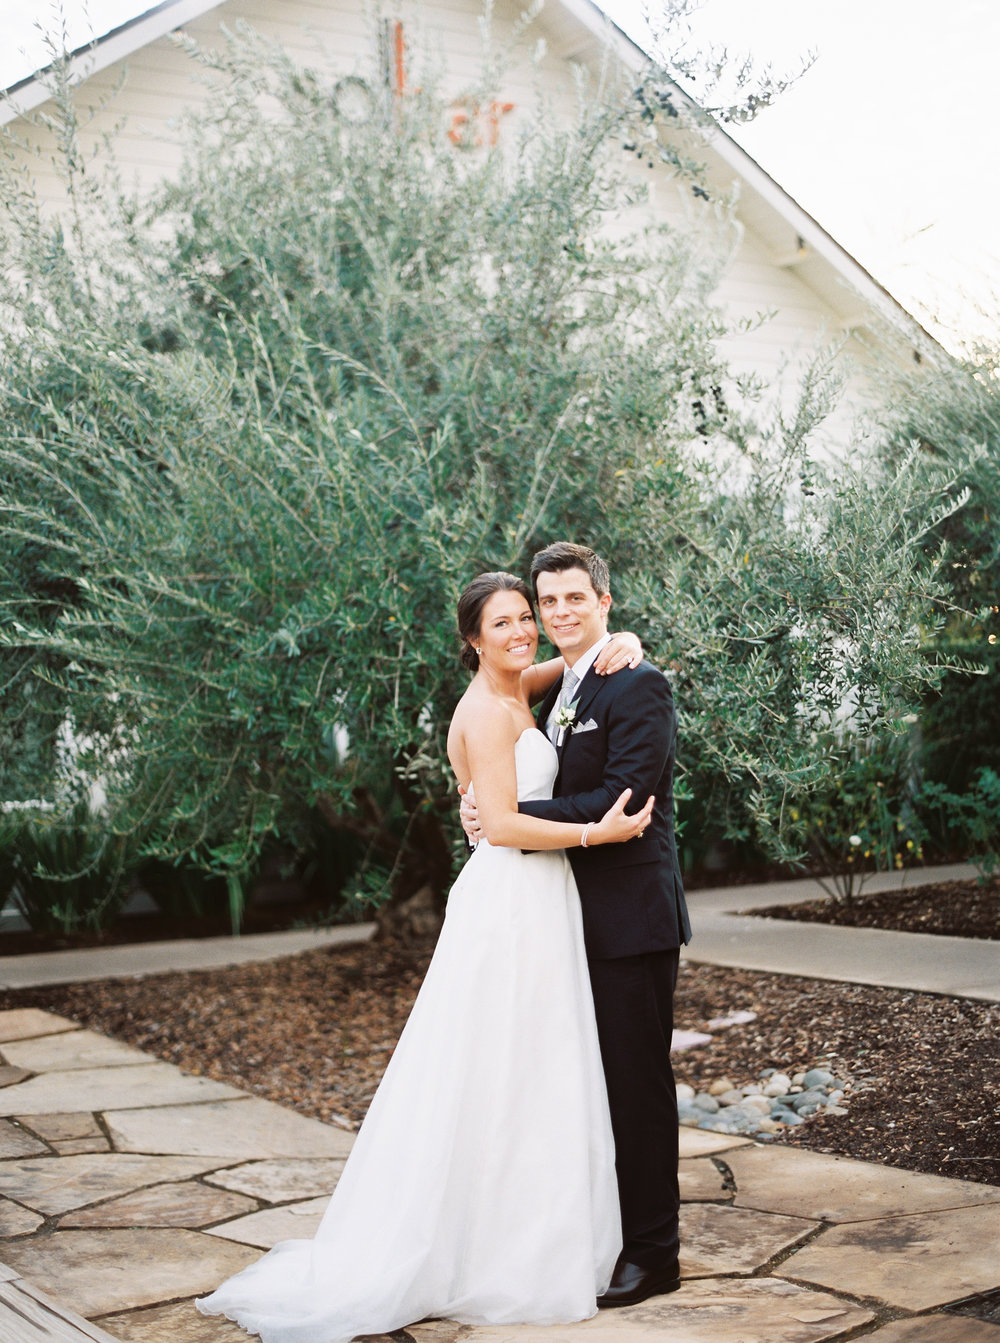 intimate-wedding-at-solage-calistoga-in-napa-164.jpg